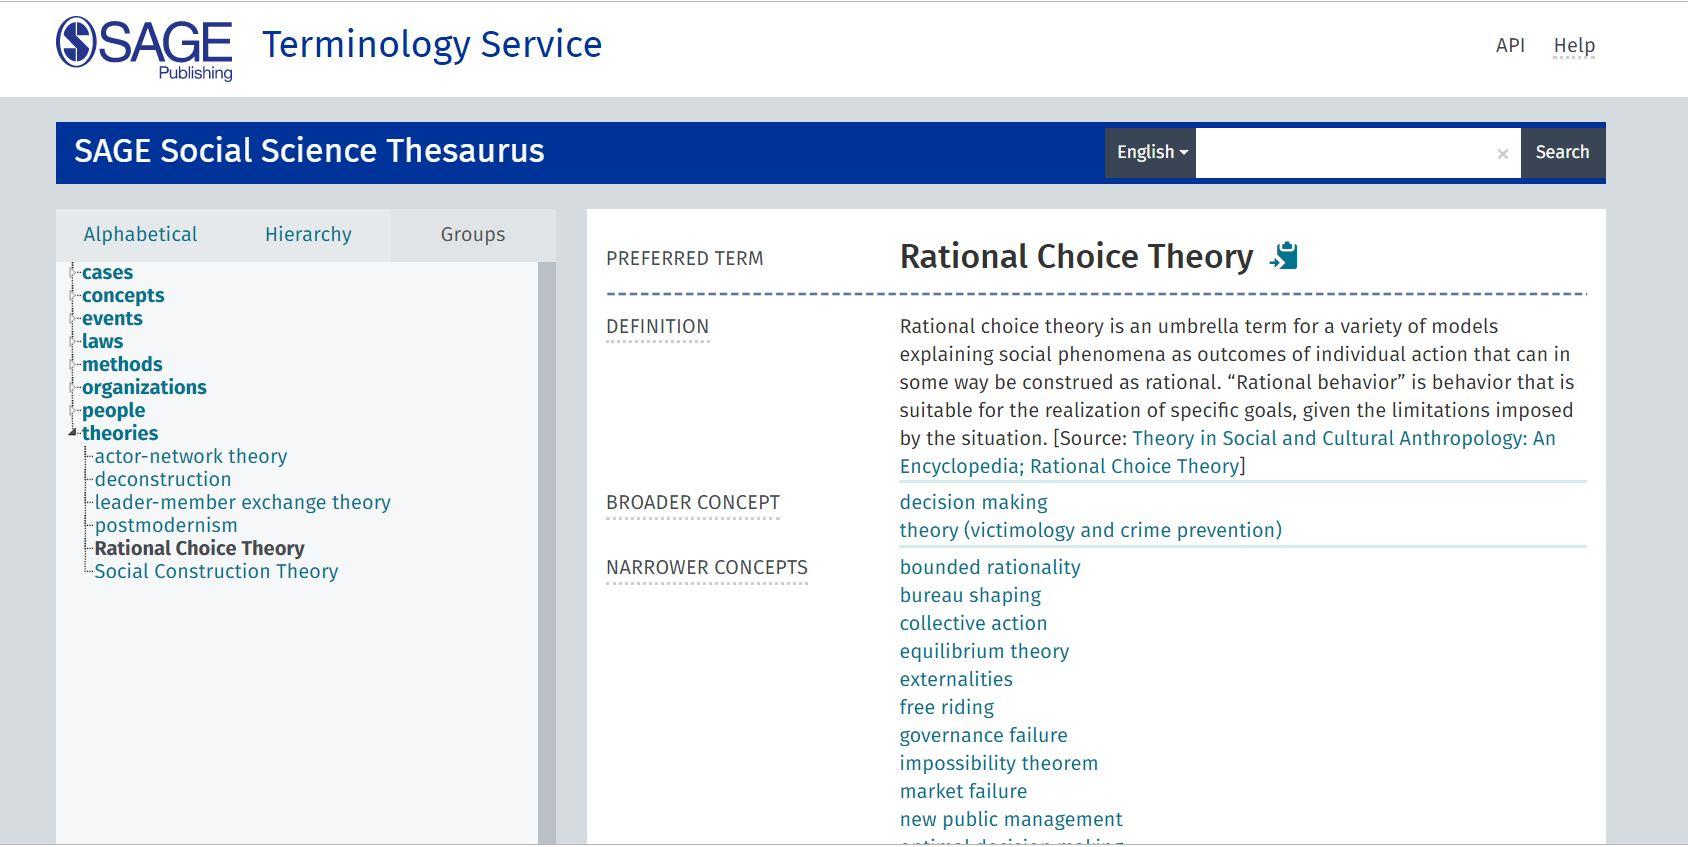 SAGE Terminology Service